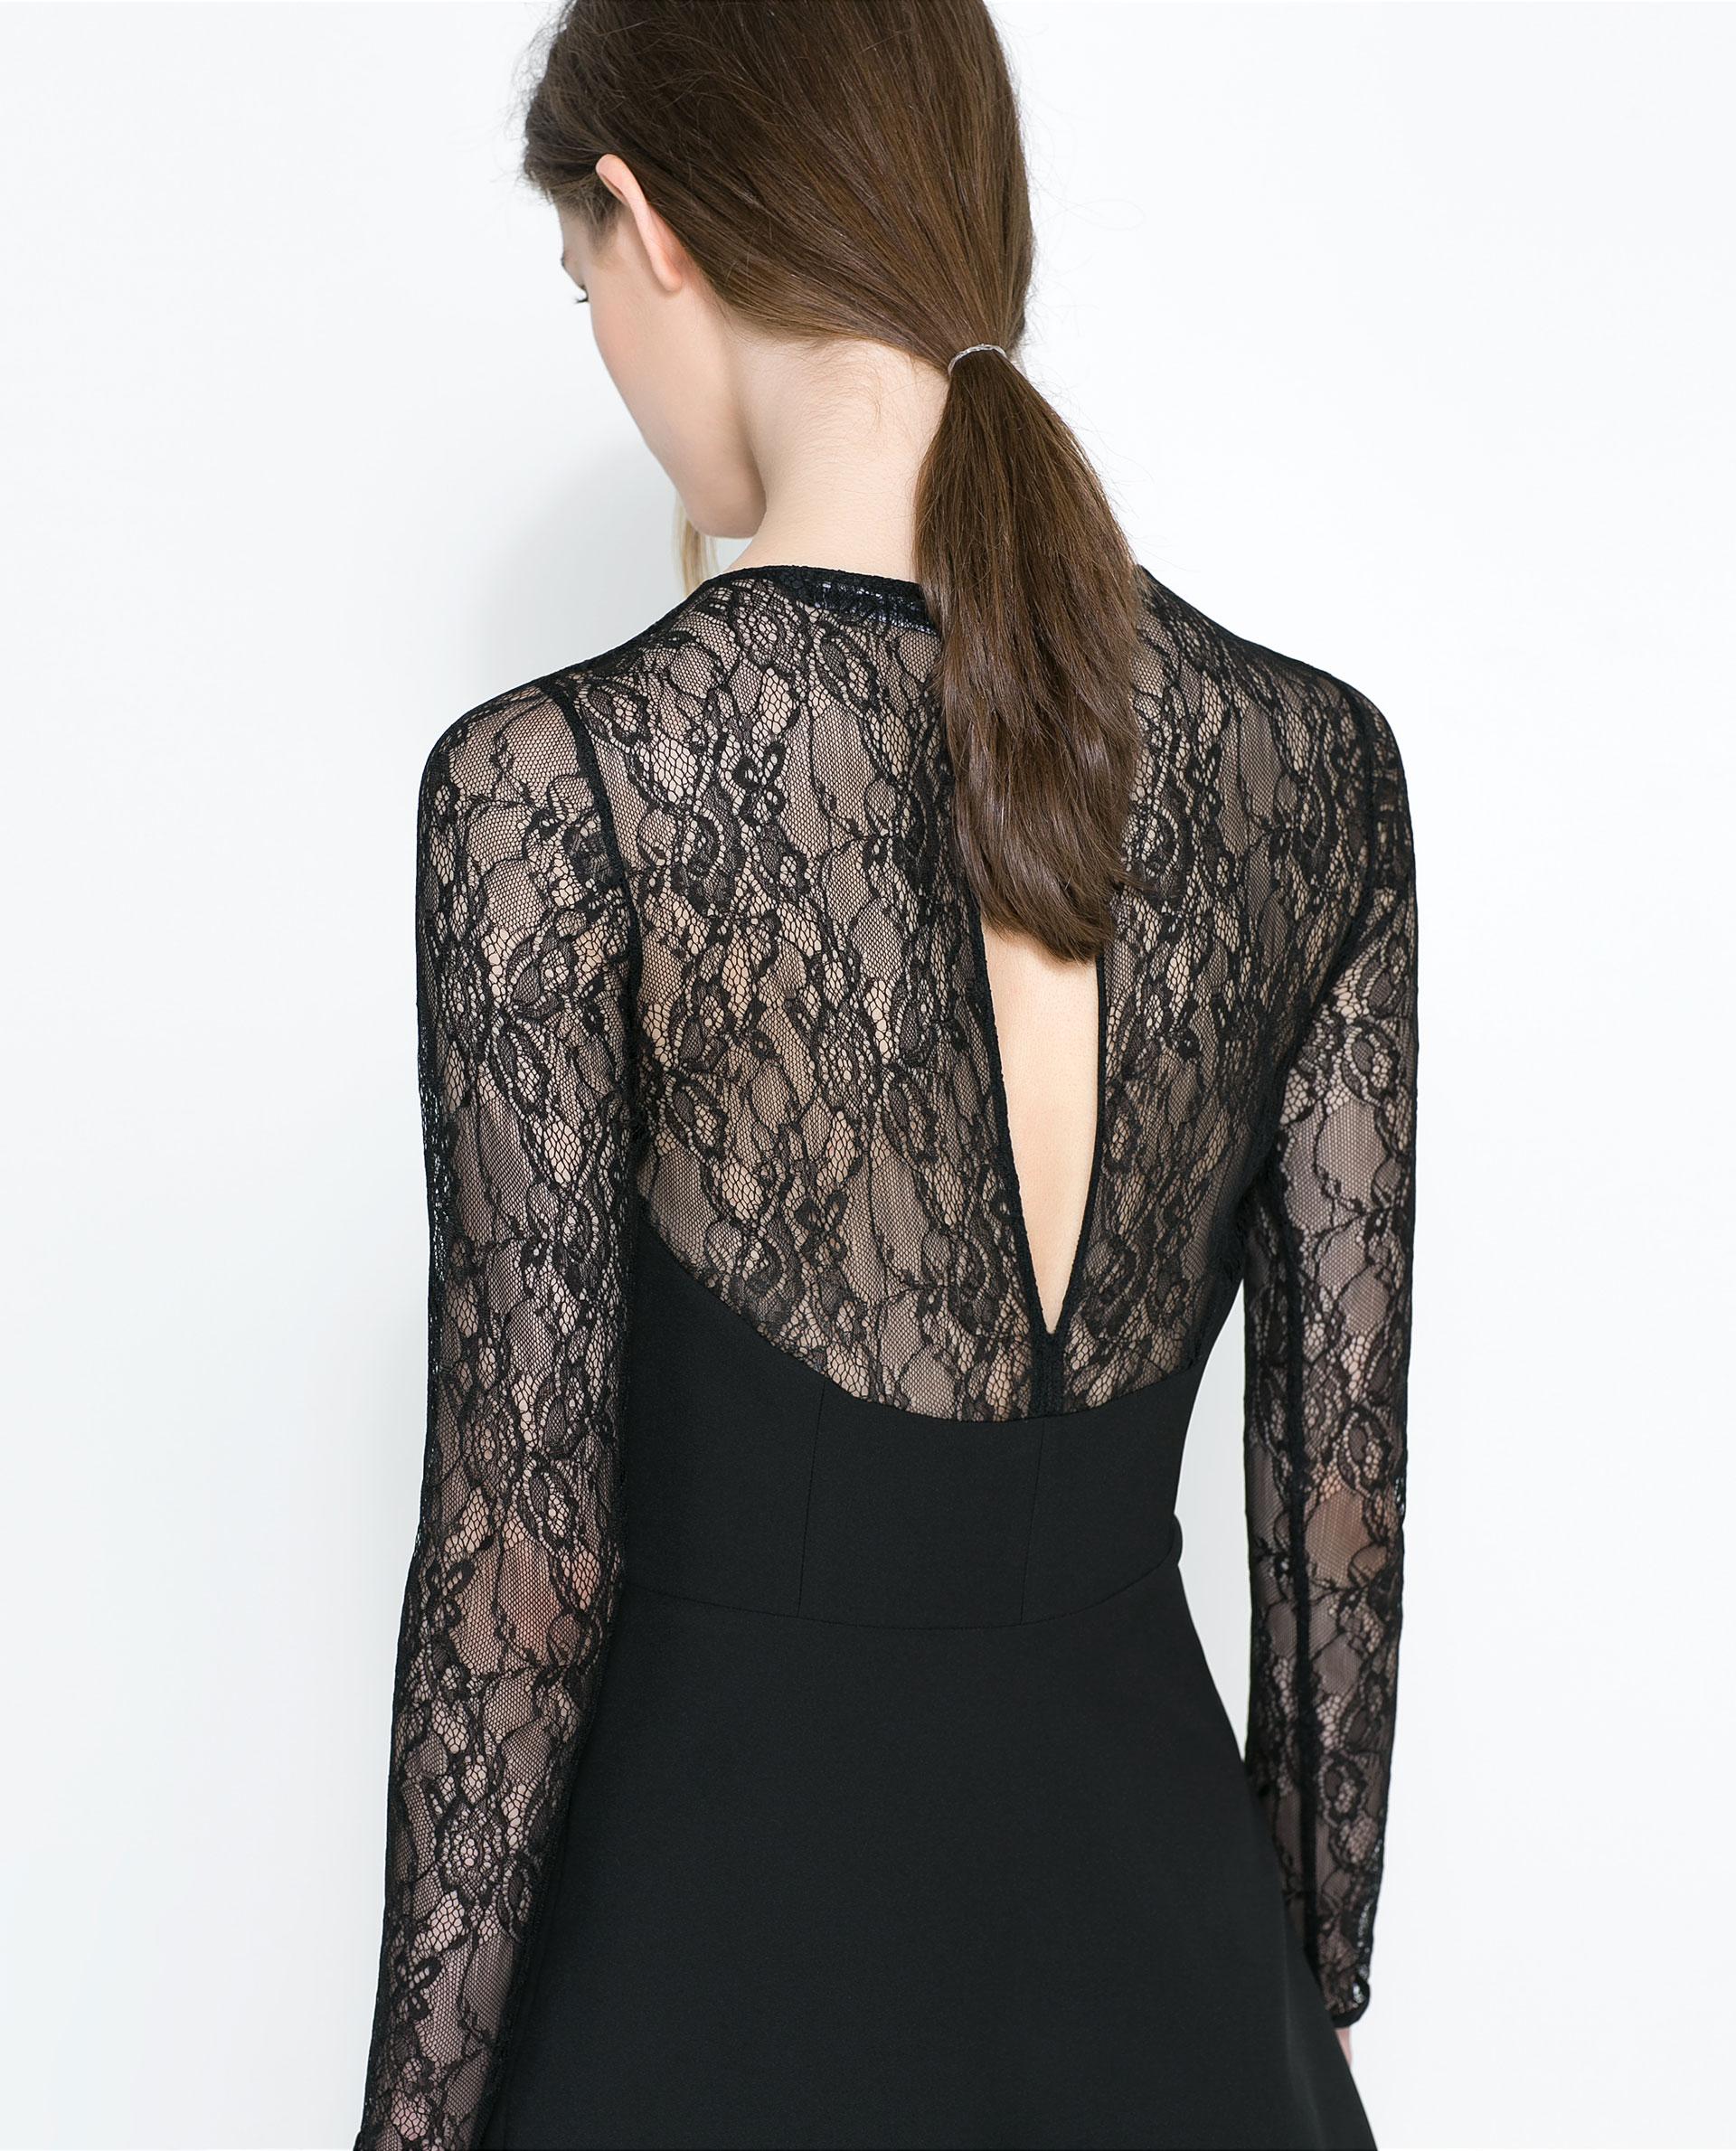 Zara Black Dress Lace Sleeves